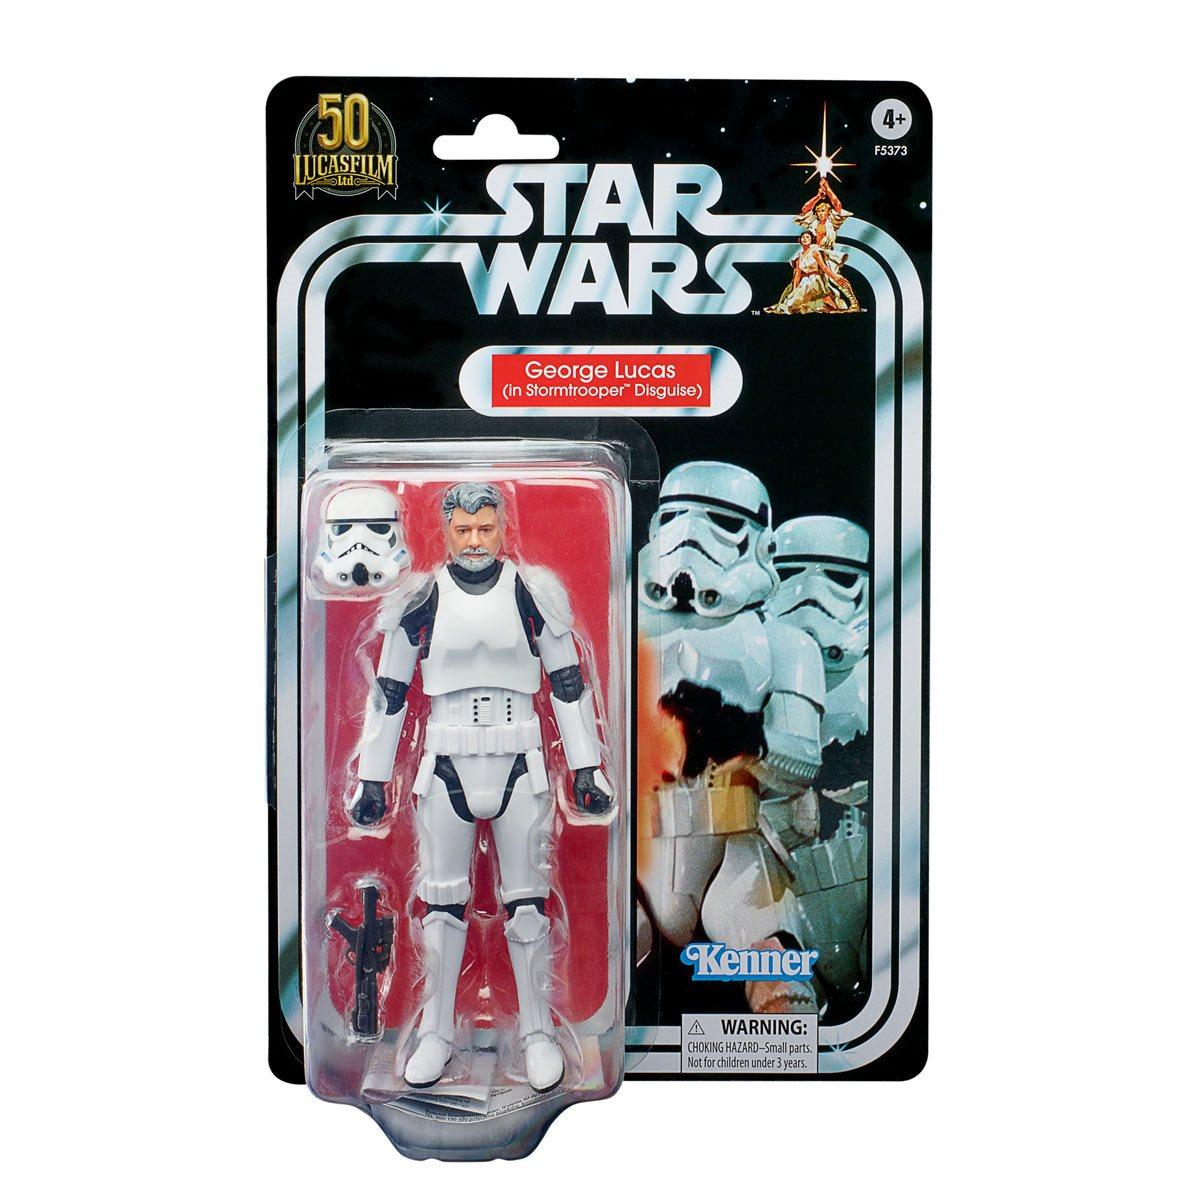 Star Wars The Black Series George Lucas Stormtrooper 6-Inch Action Figure画像